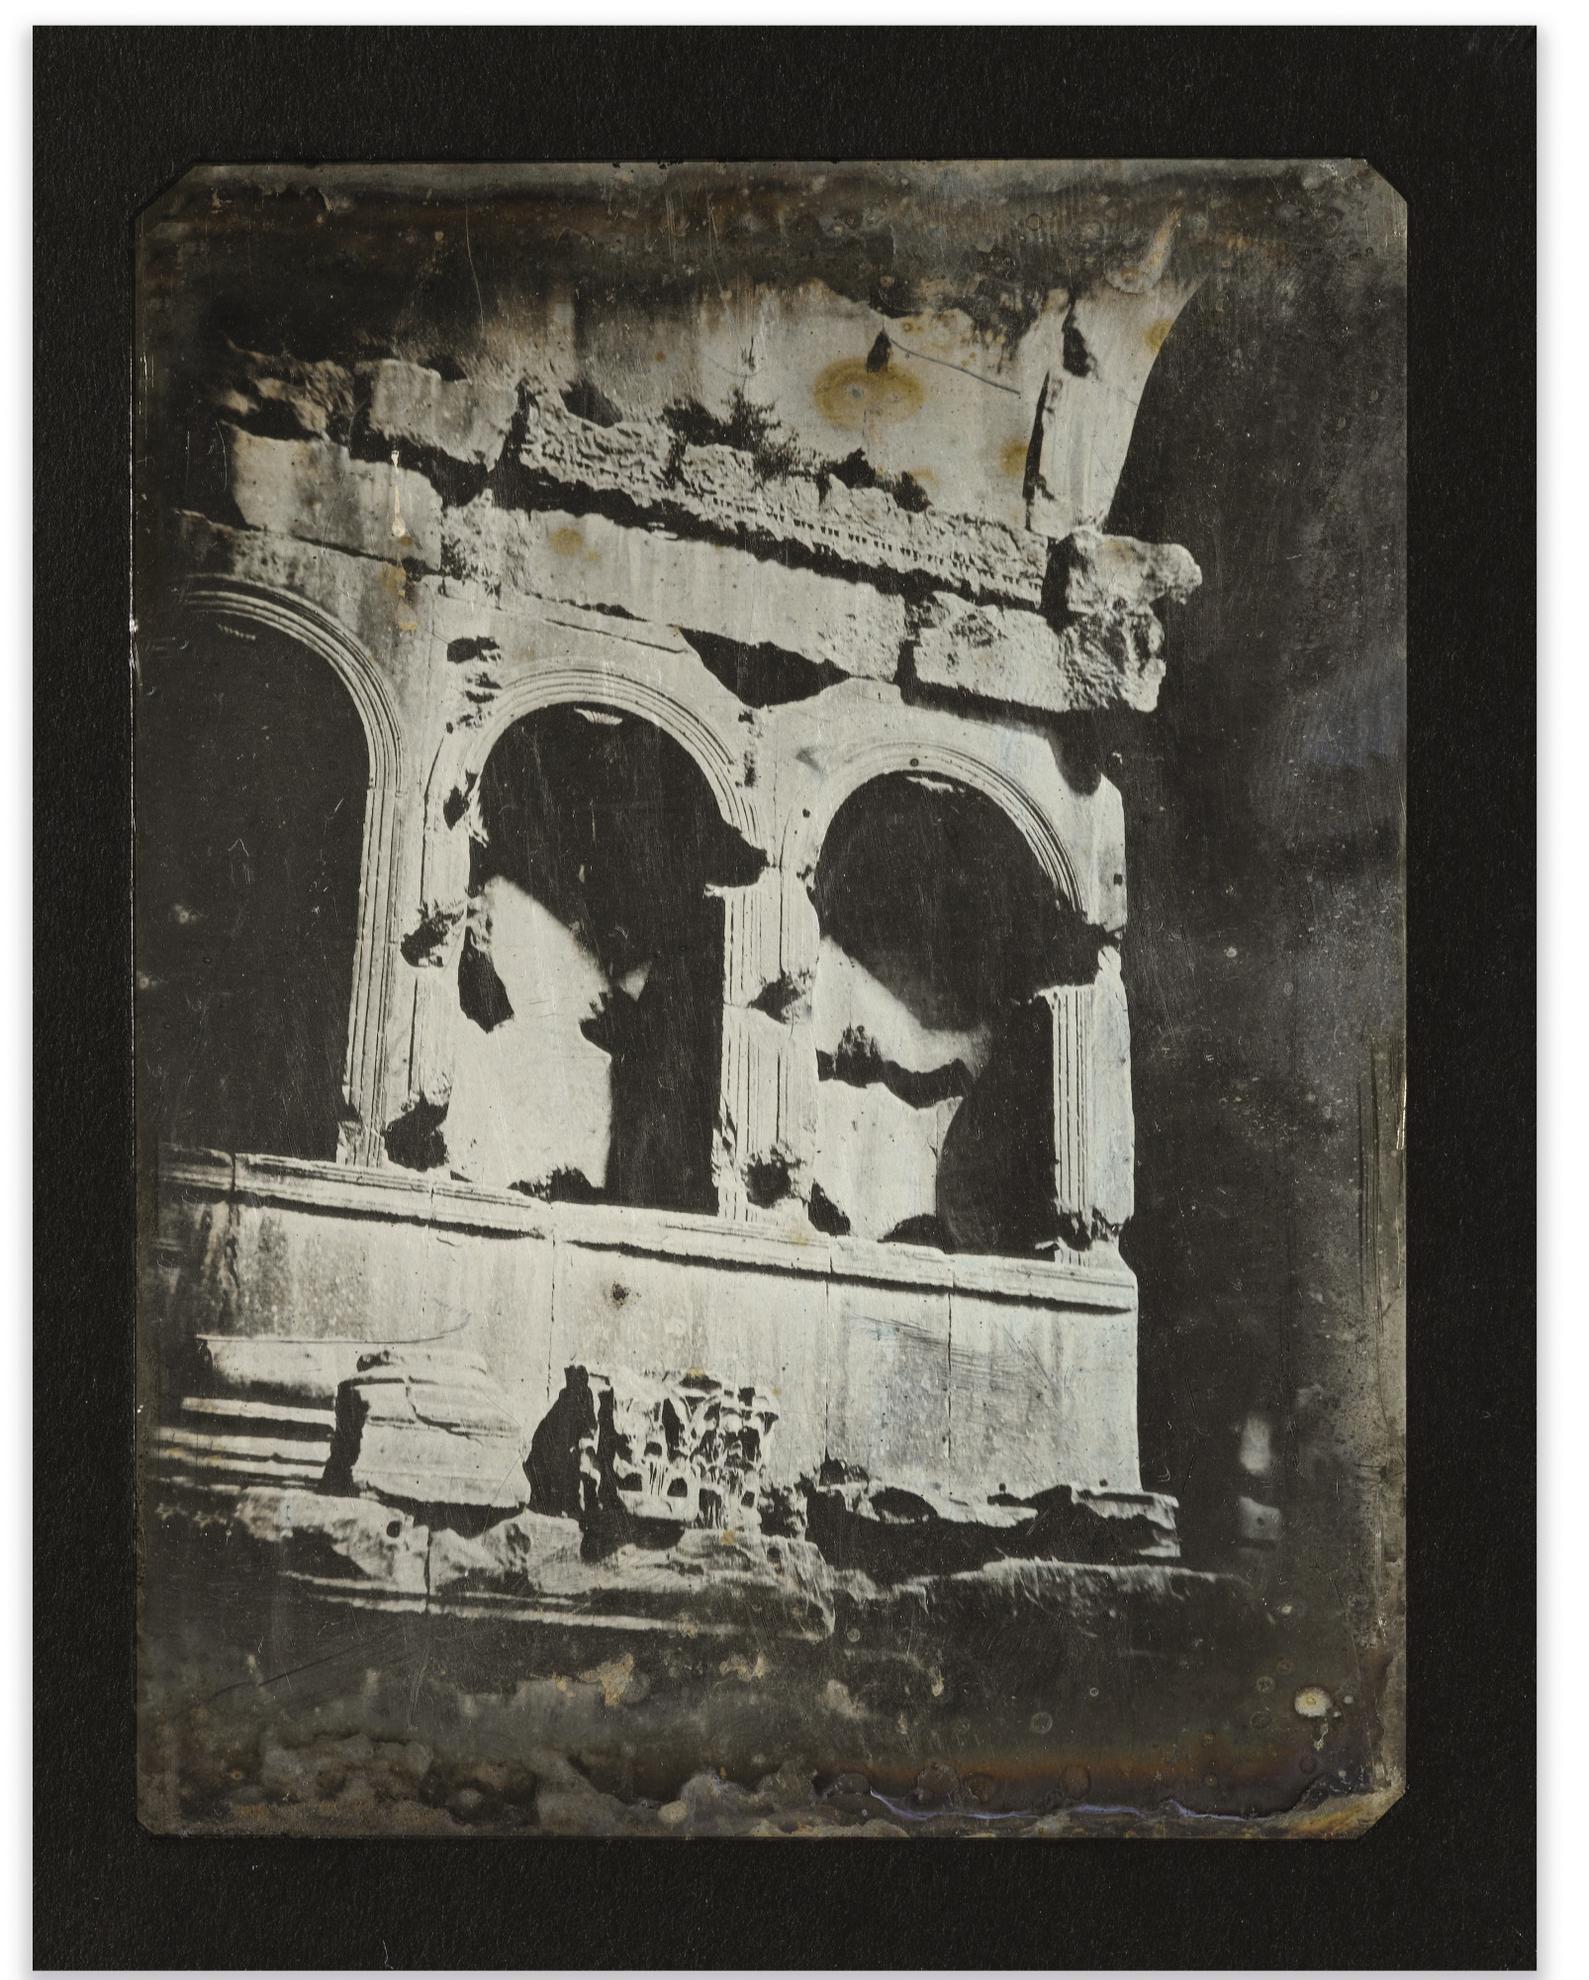 Joseph Philibert Girault De Prangey - 59. Rome, Arc De Janus, Details-1842